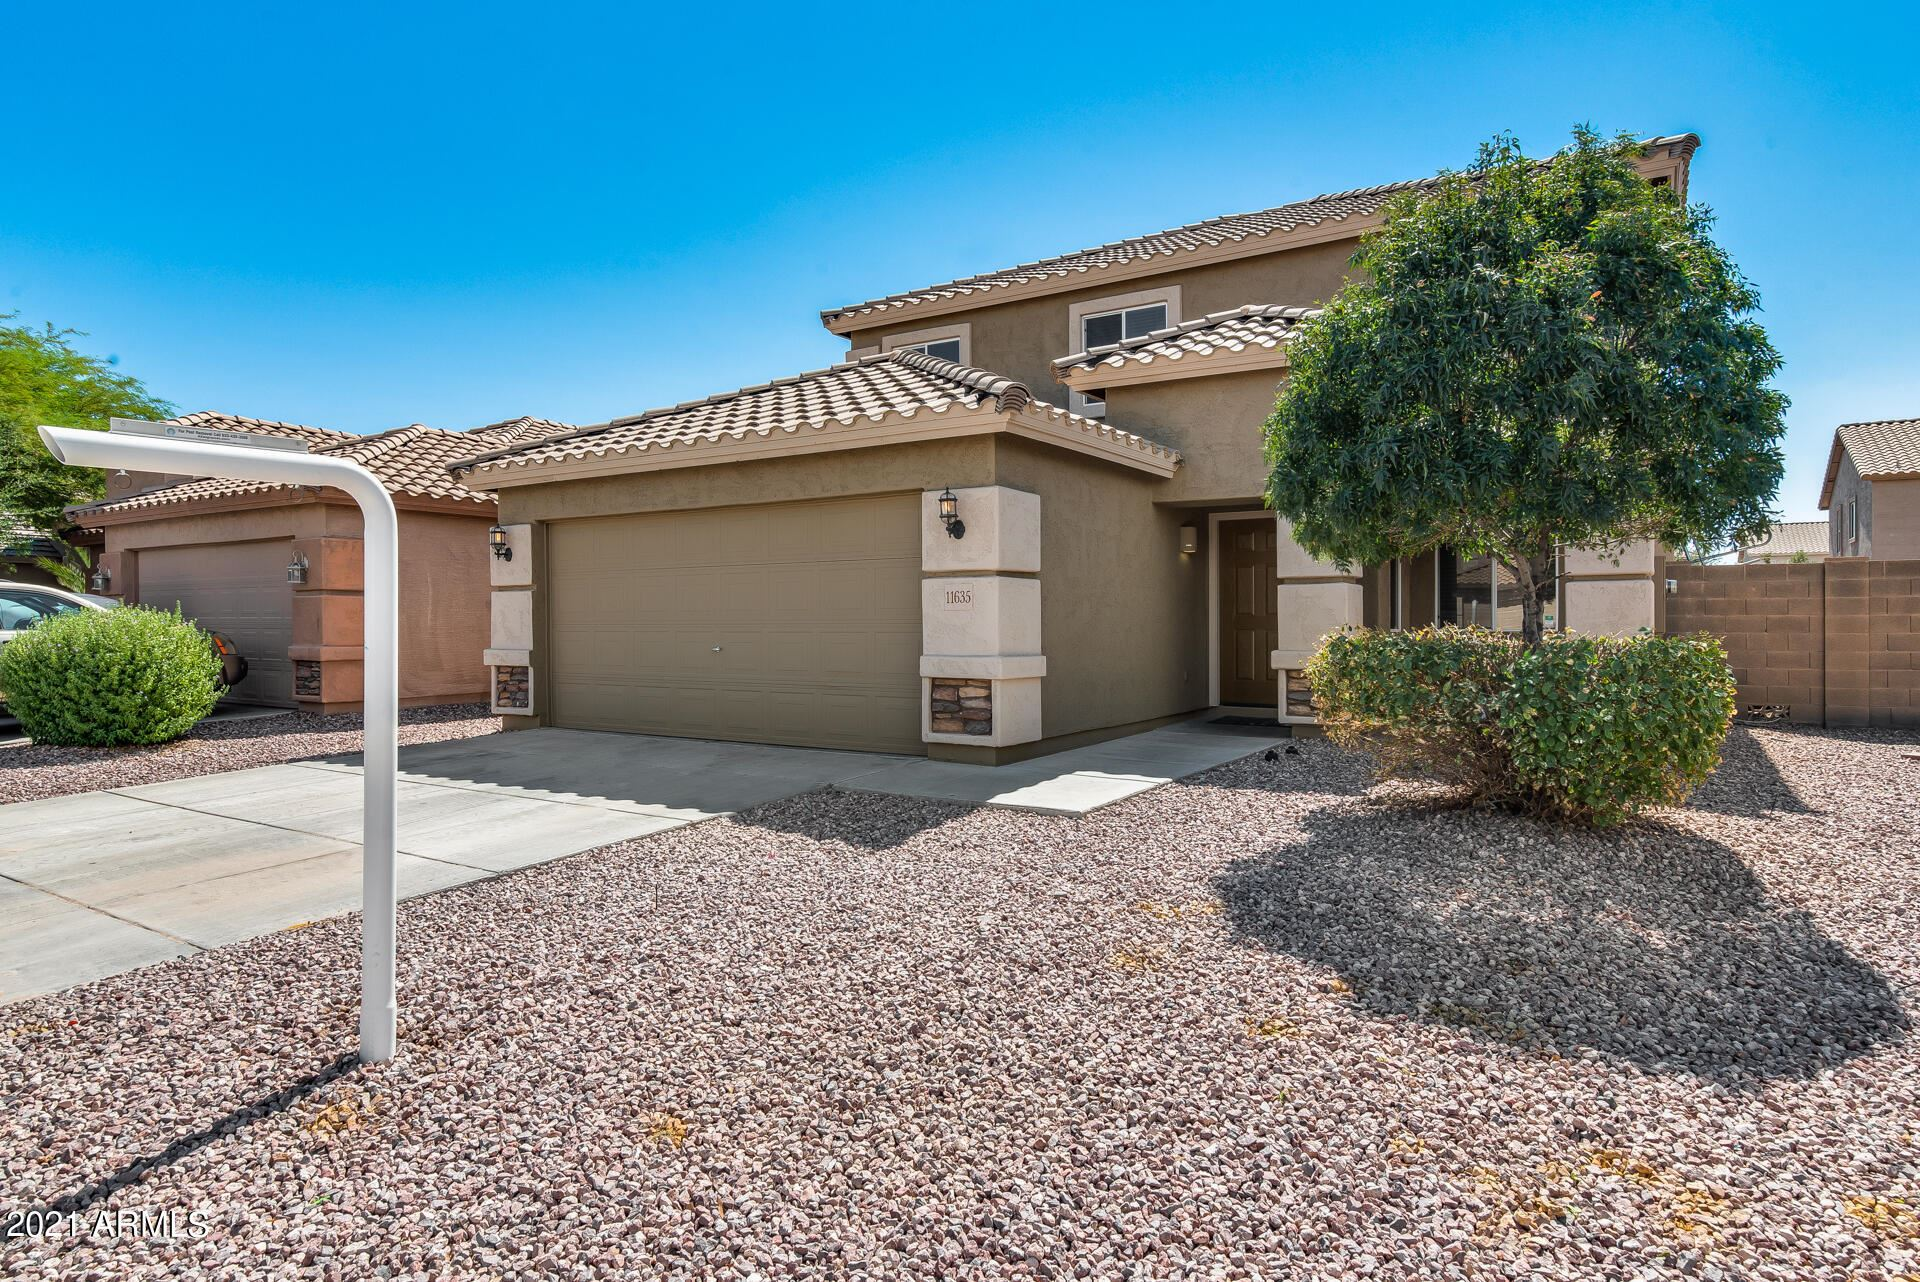 Photo of 11635 W LONGLEY Lane, Youngtown, AZ 85363 (MLS # 6299185)